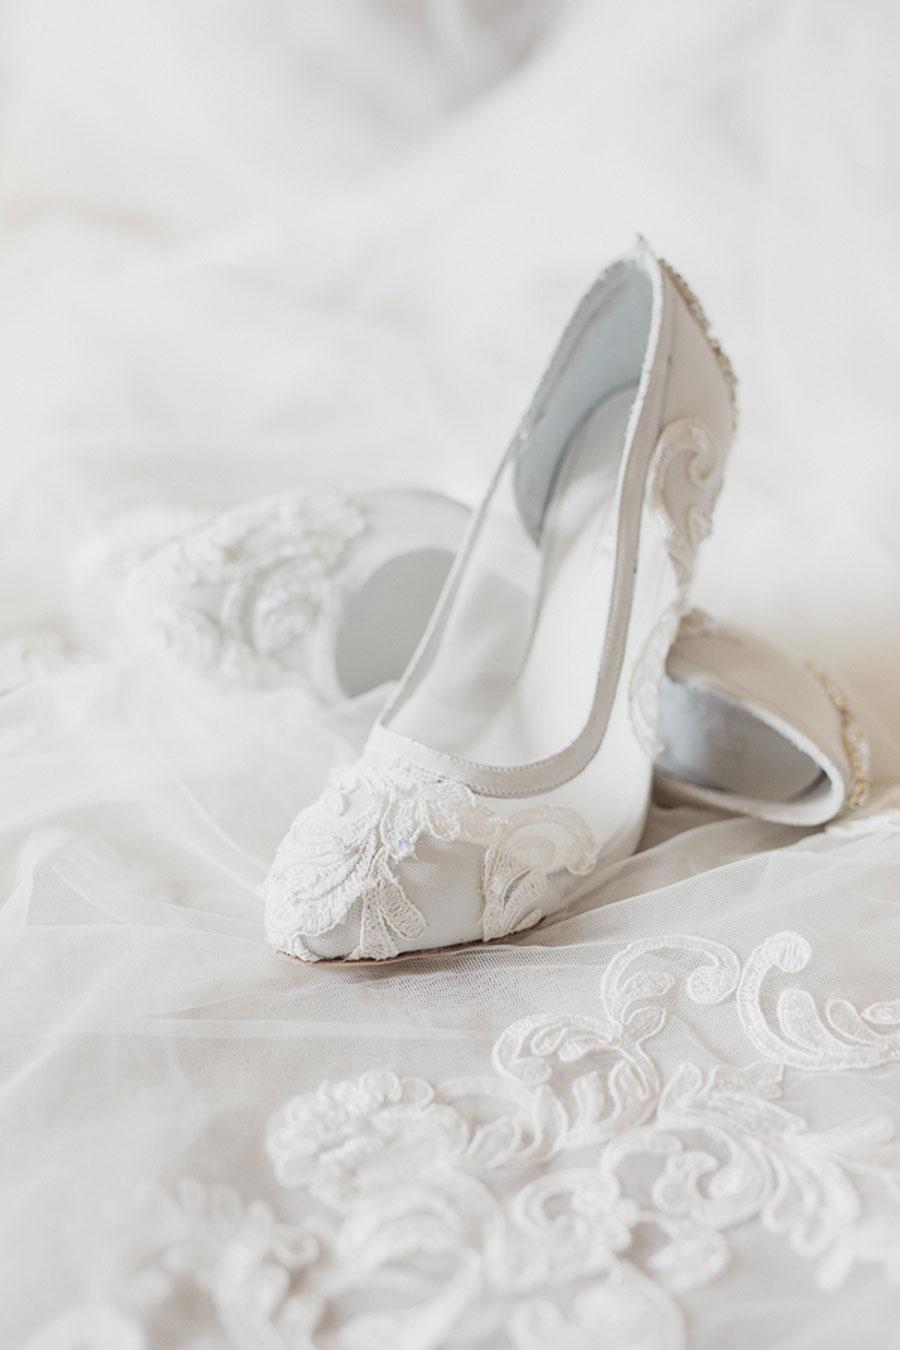 Wedding-Nicholad-and-Federica-Giuseppe-Giovannelli-307